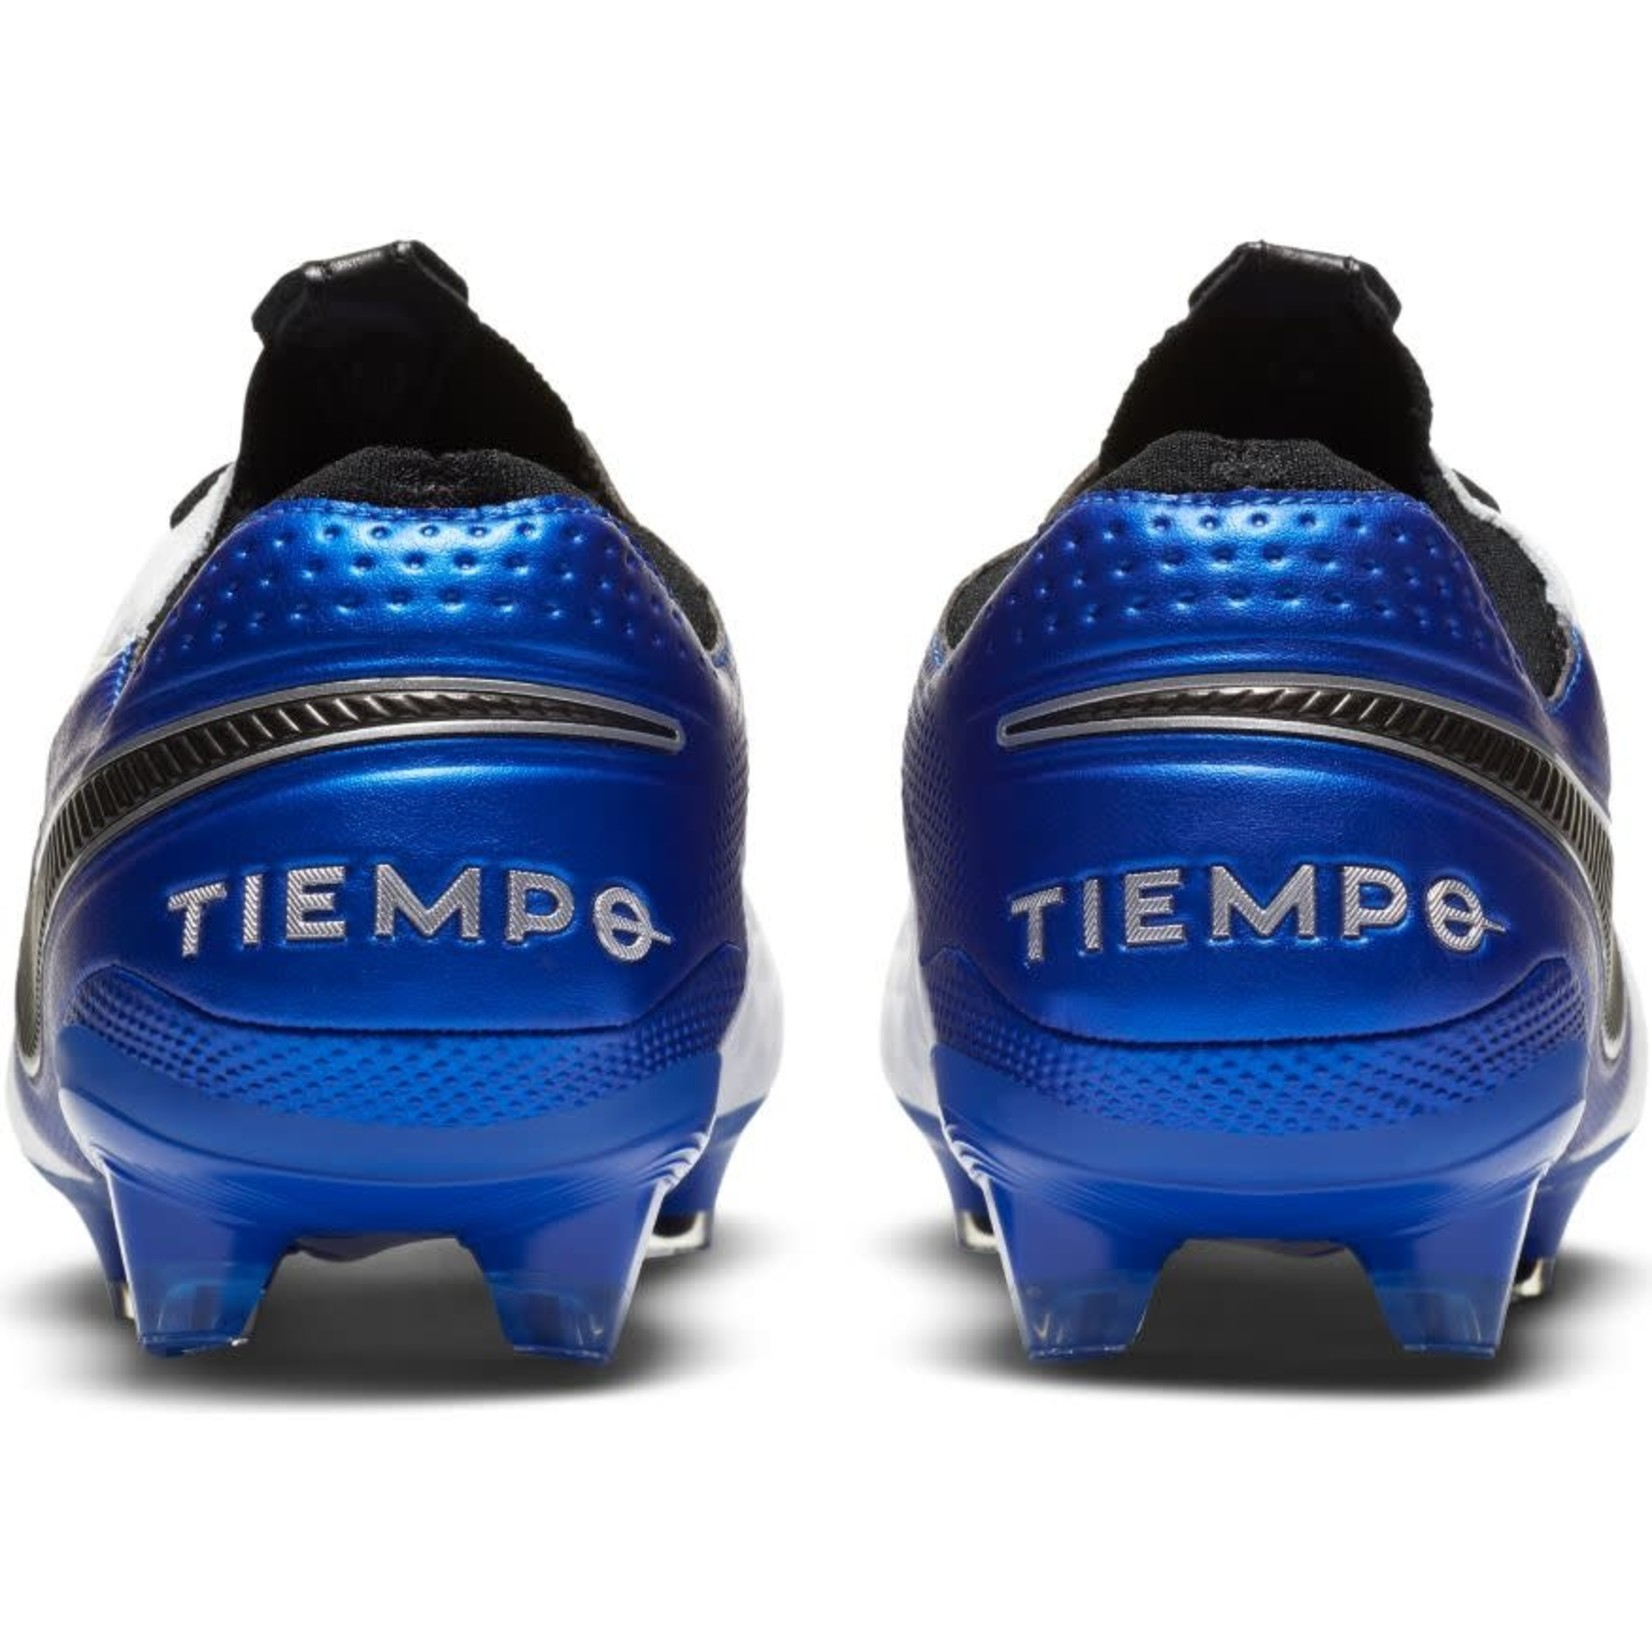 NIKE TIEMPO LEGEND 8 ELITE FG (WHITE/BLUE)